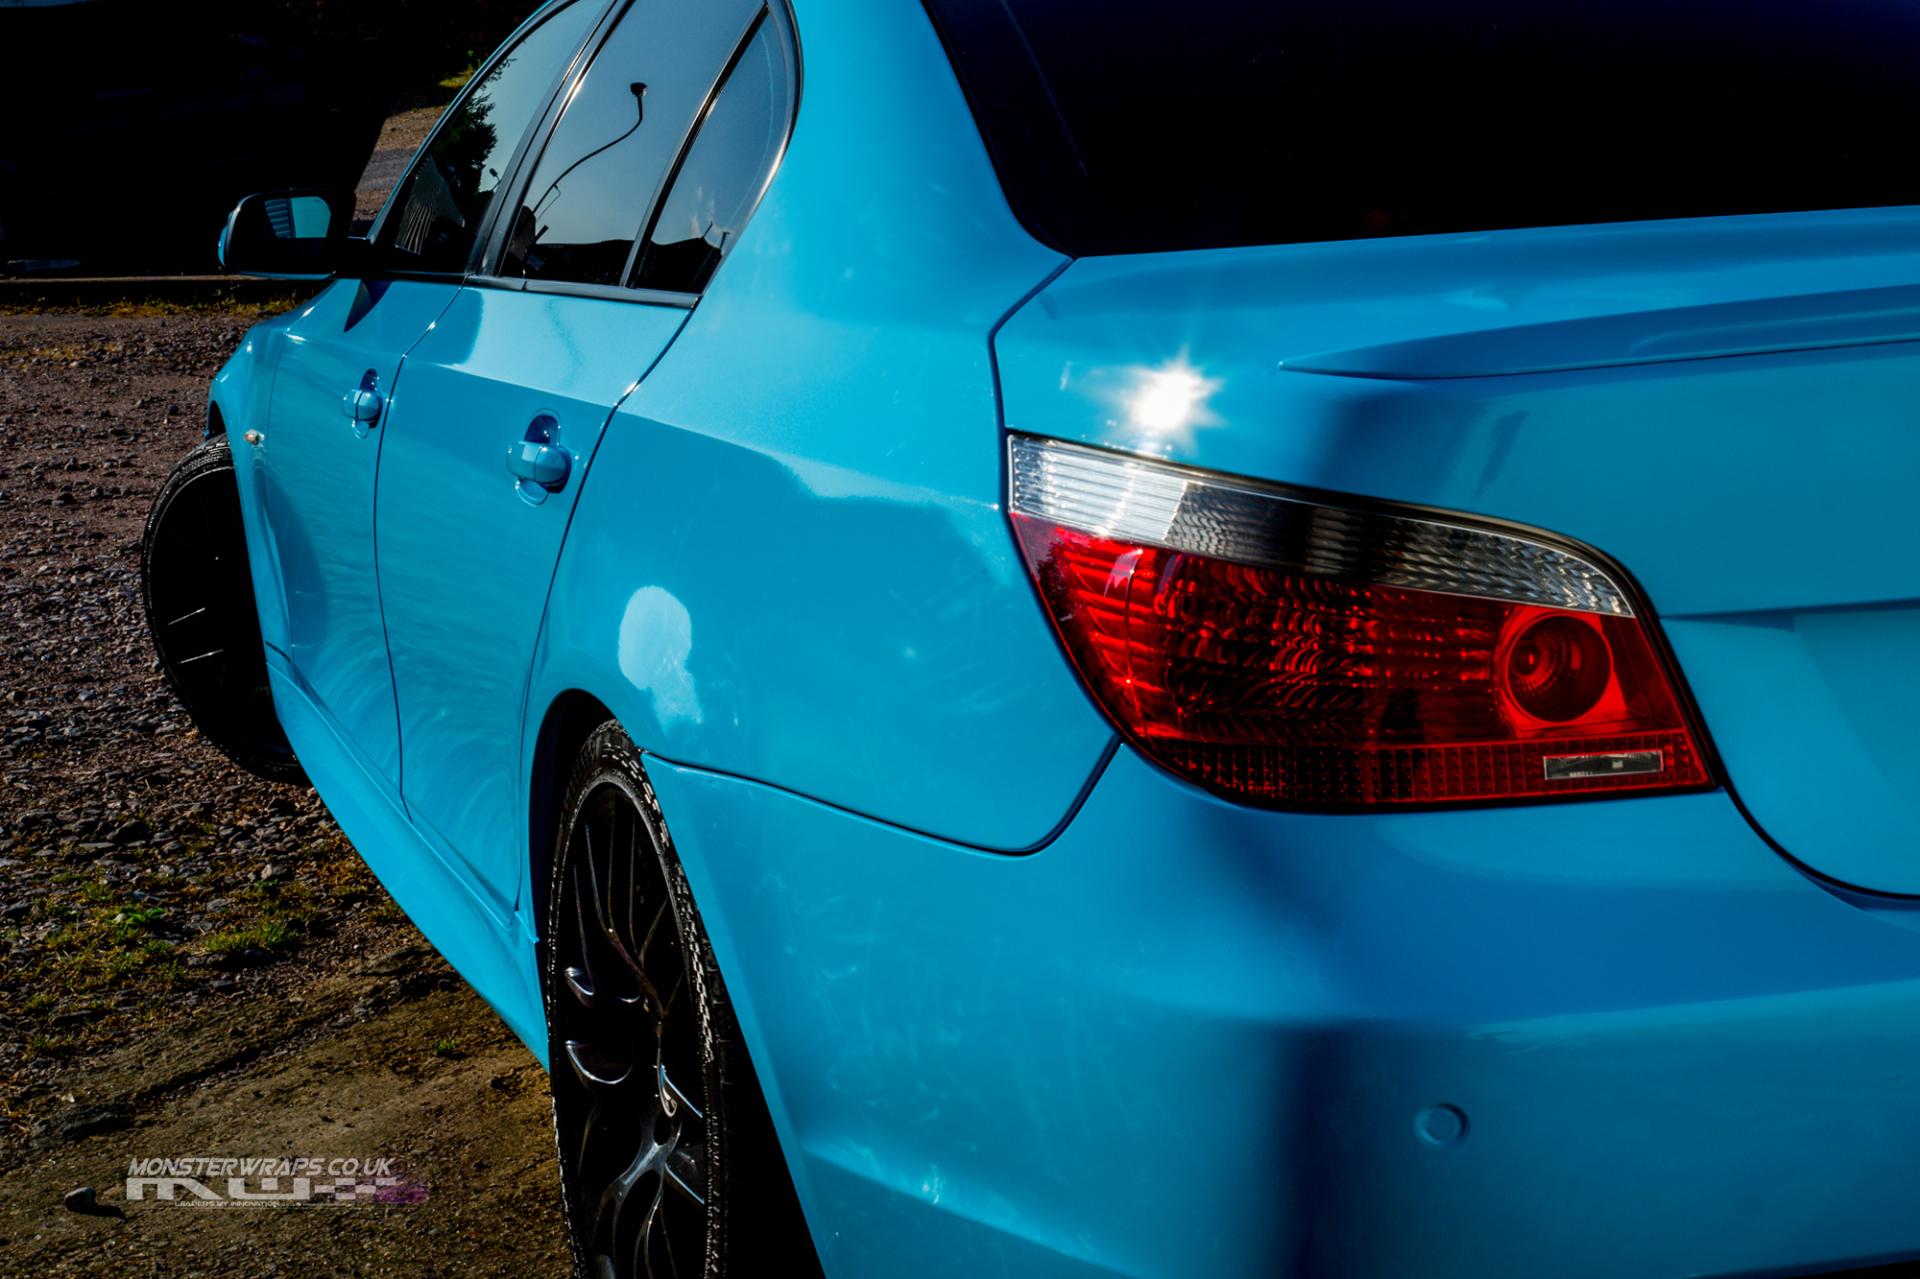 BMW 5 Series E60 3M 1080 Gloss sky blue wrap monsterwraps